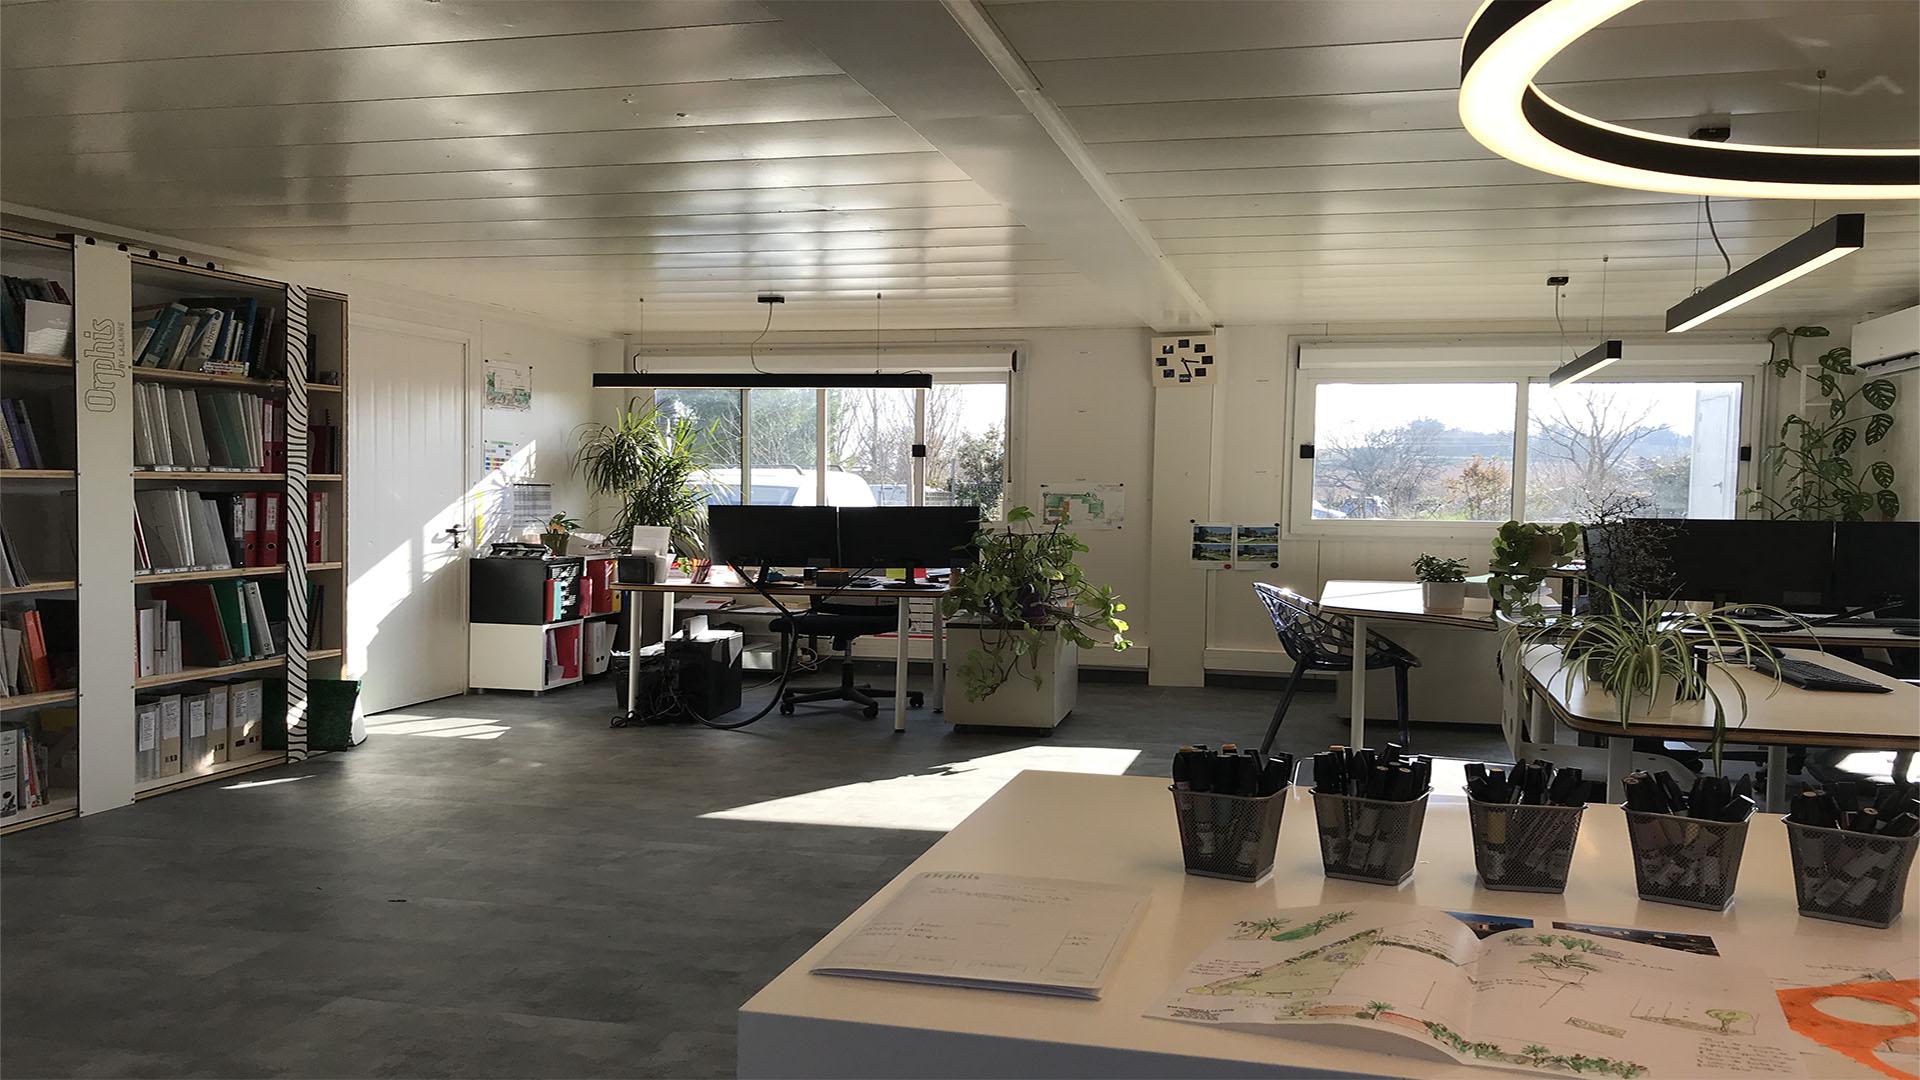 Bureau D Étude Paysage bureau d'étude paysagiste amenagement jardin et terrasse